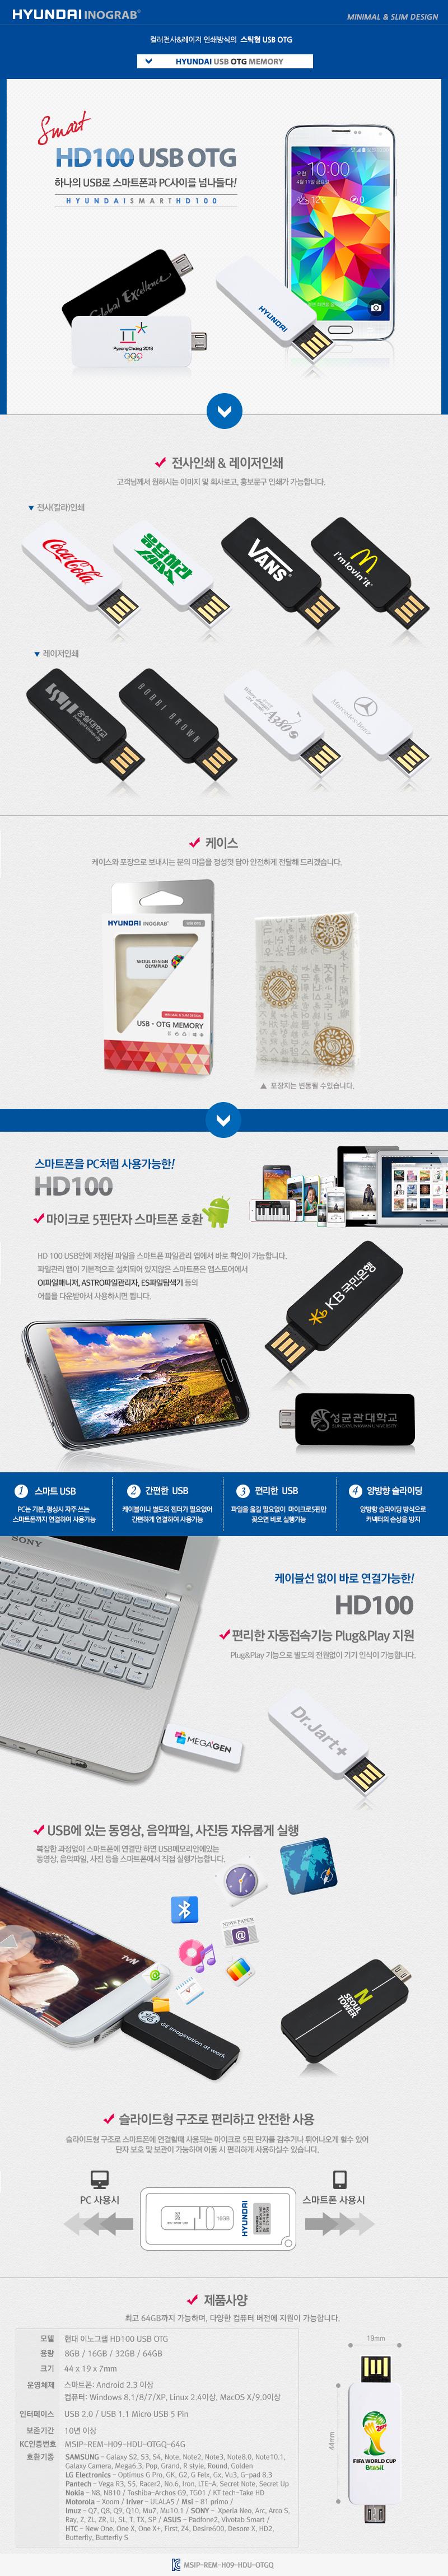 HD100_promotion_detail_800.jpg